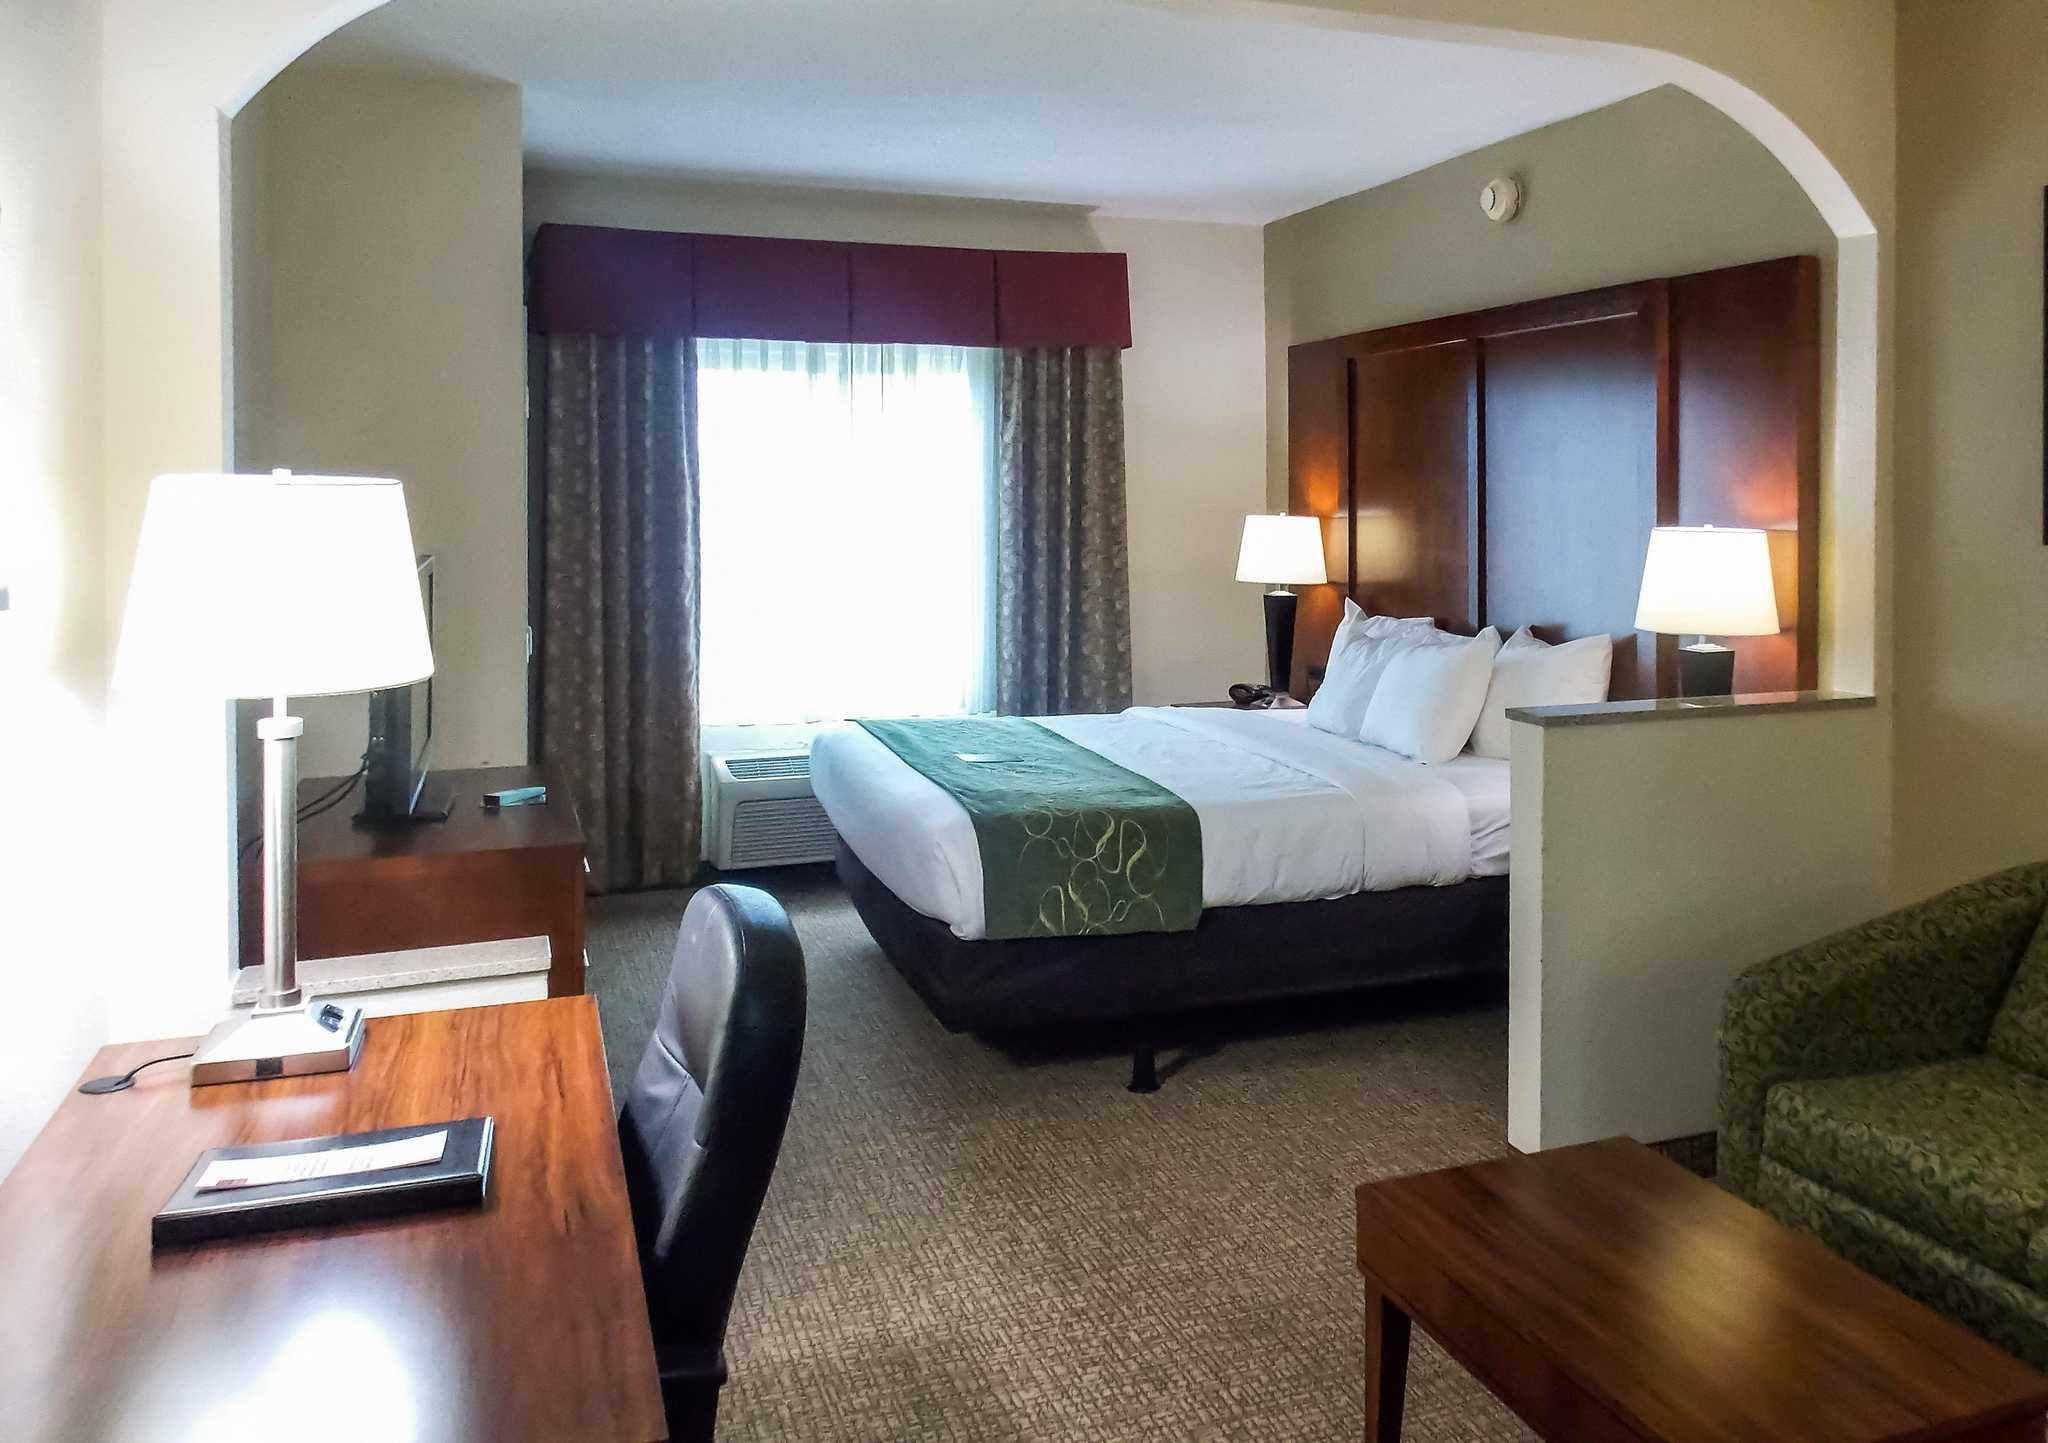 Comfort Suites Inn at Ridgewood Farm image 4